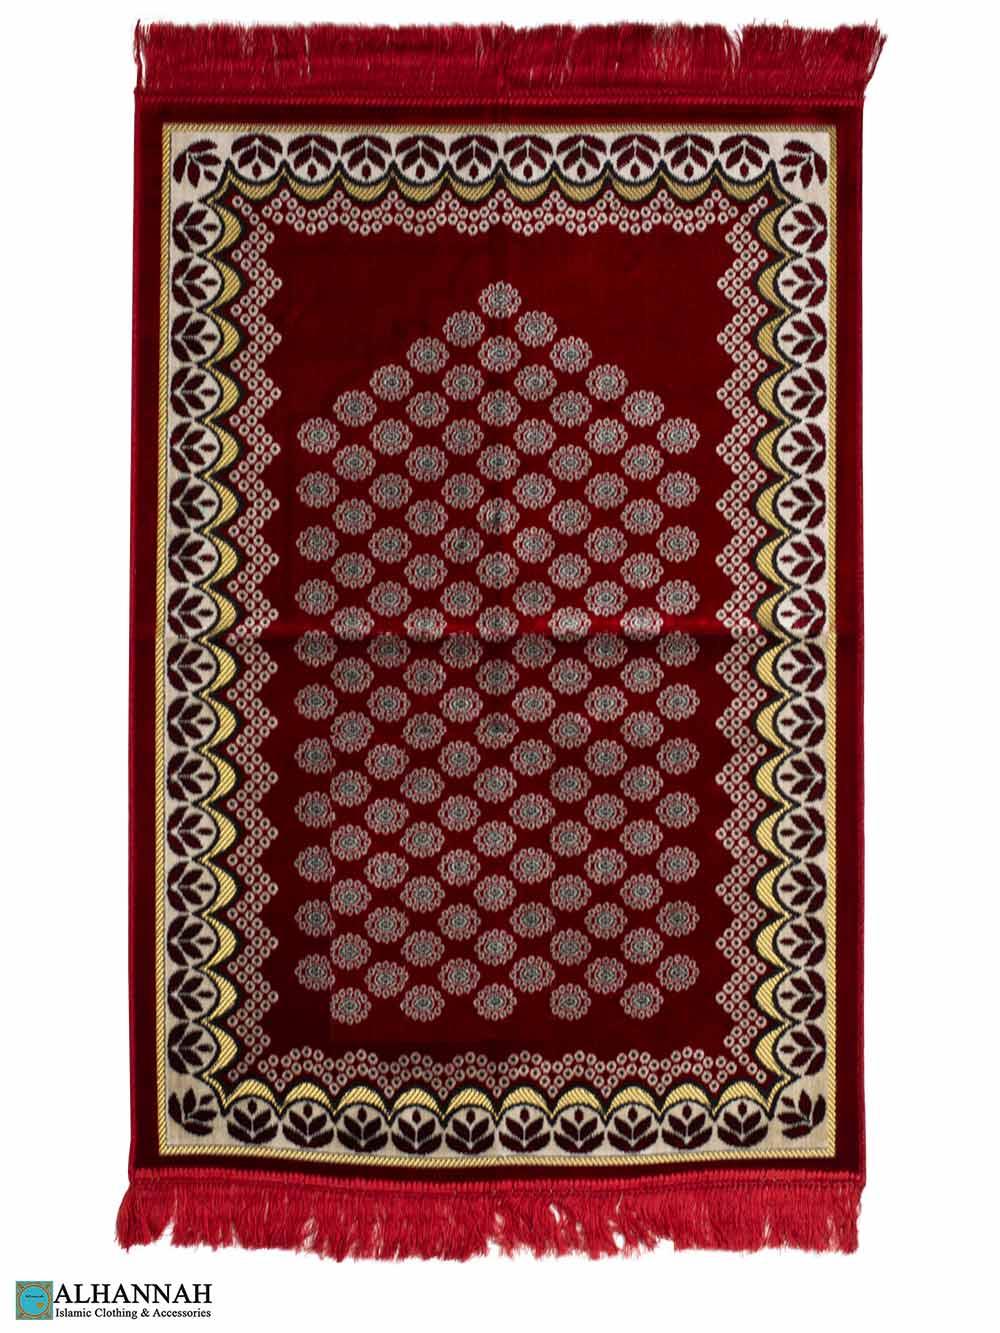 Prayer Rug with Foliage Border - Red